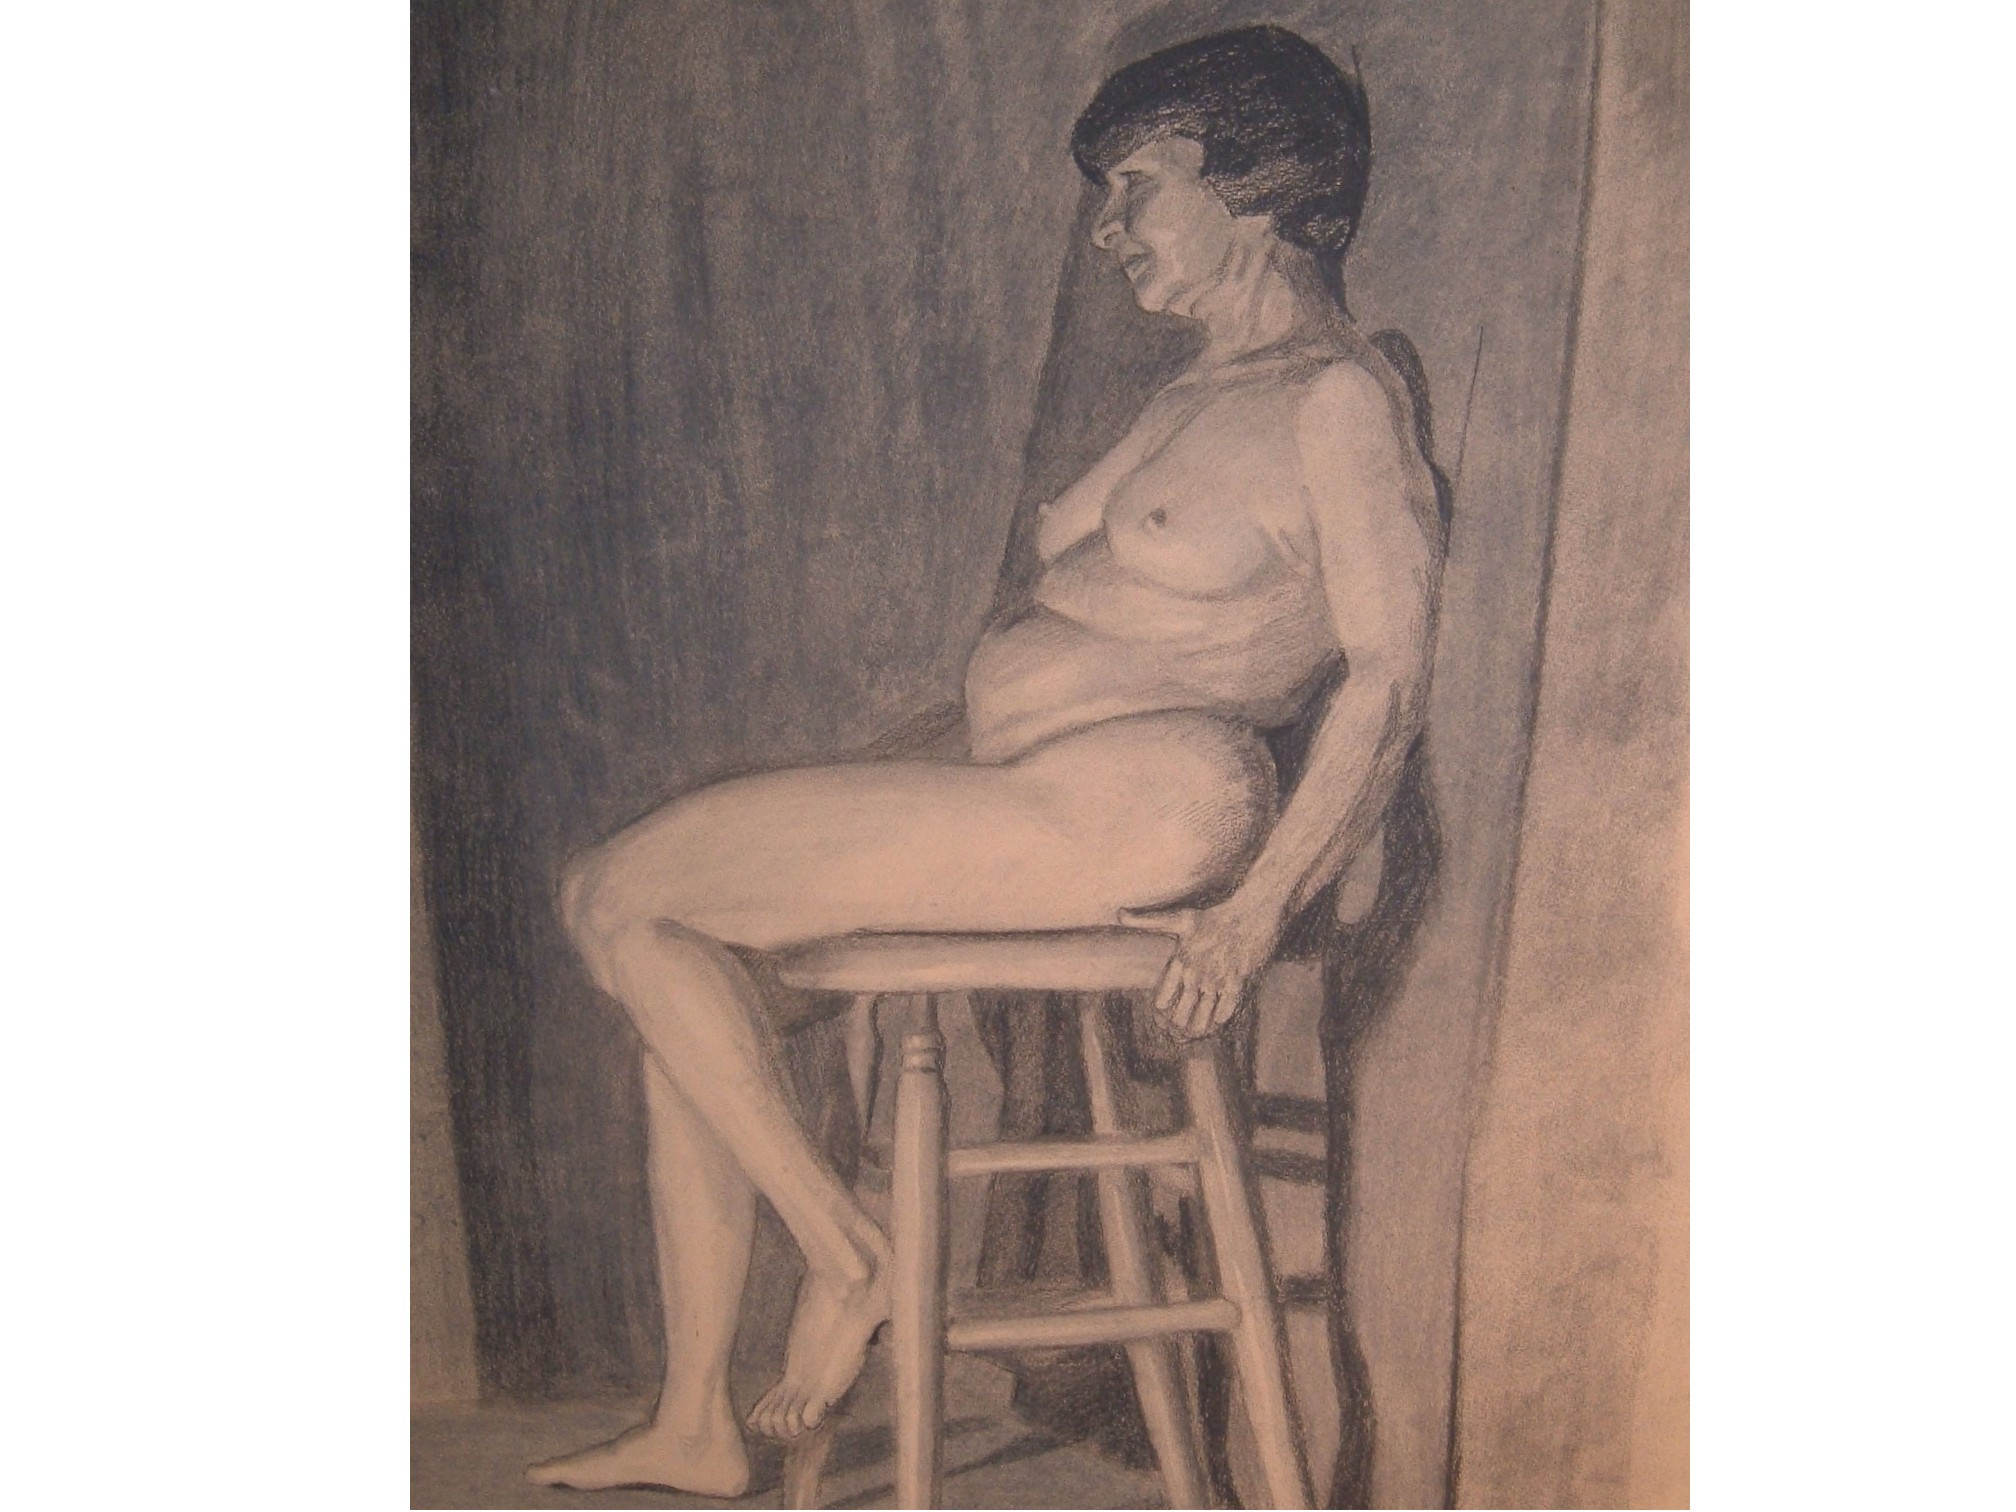 w_sketch_sitting_nude.jpg